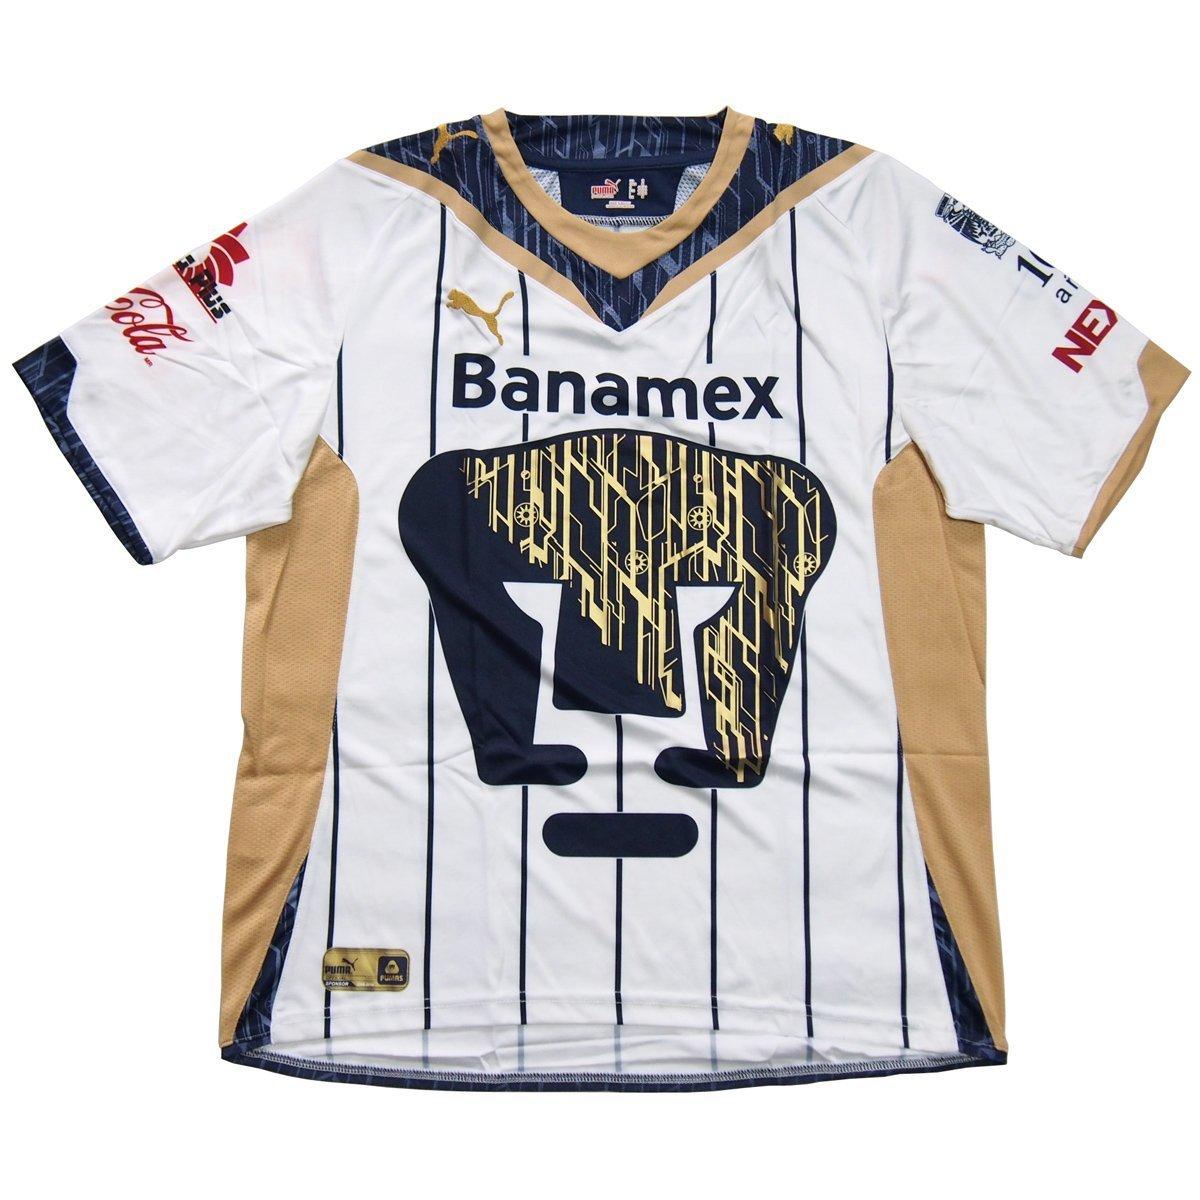 048542ab782 Amazon.com: Pumas UNAM Home Men Jersey (X-Large) (0014181643642): Books